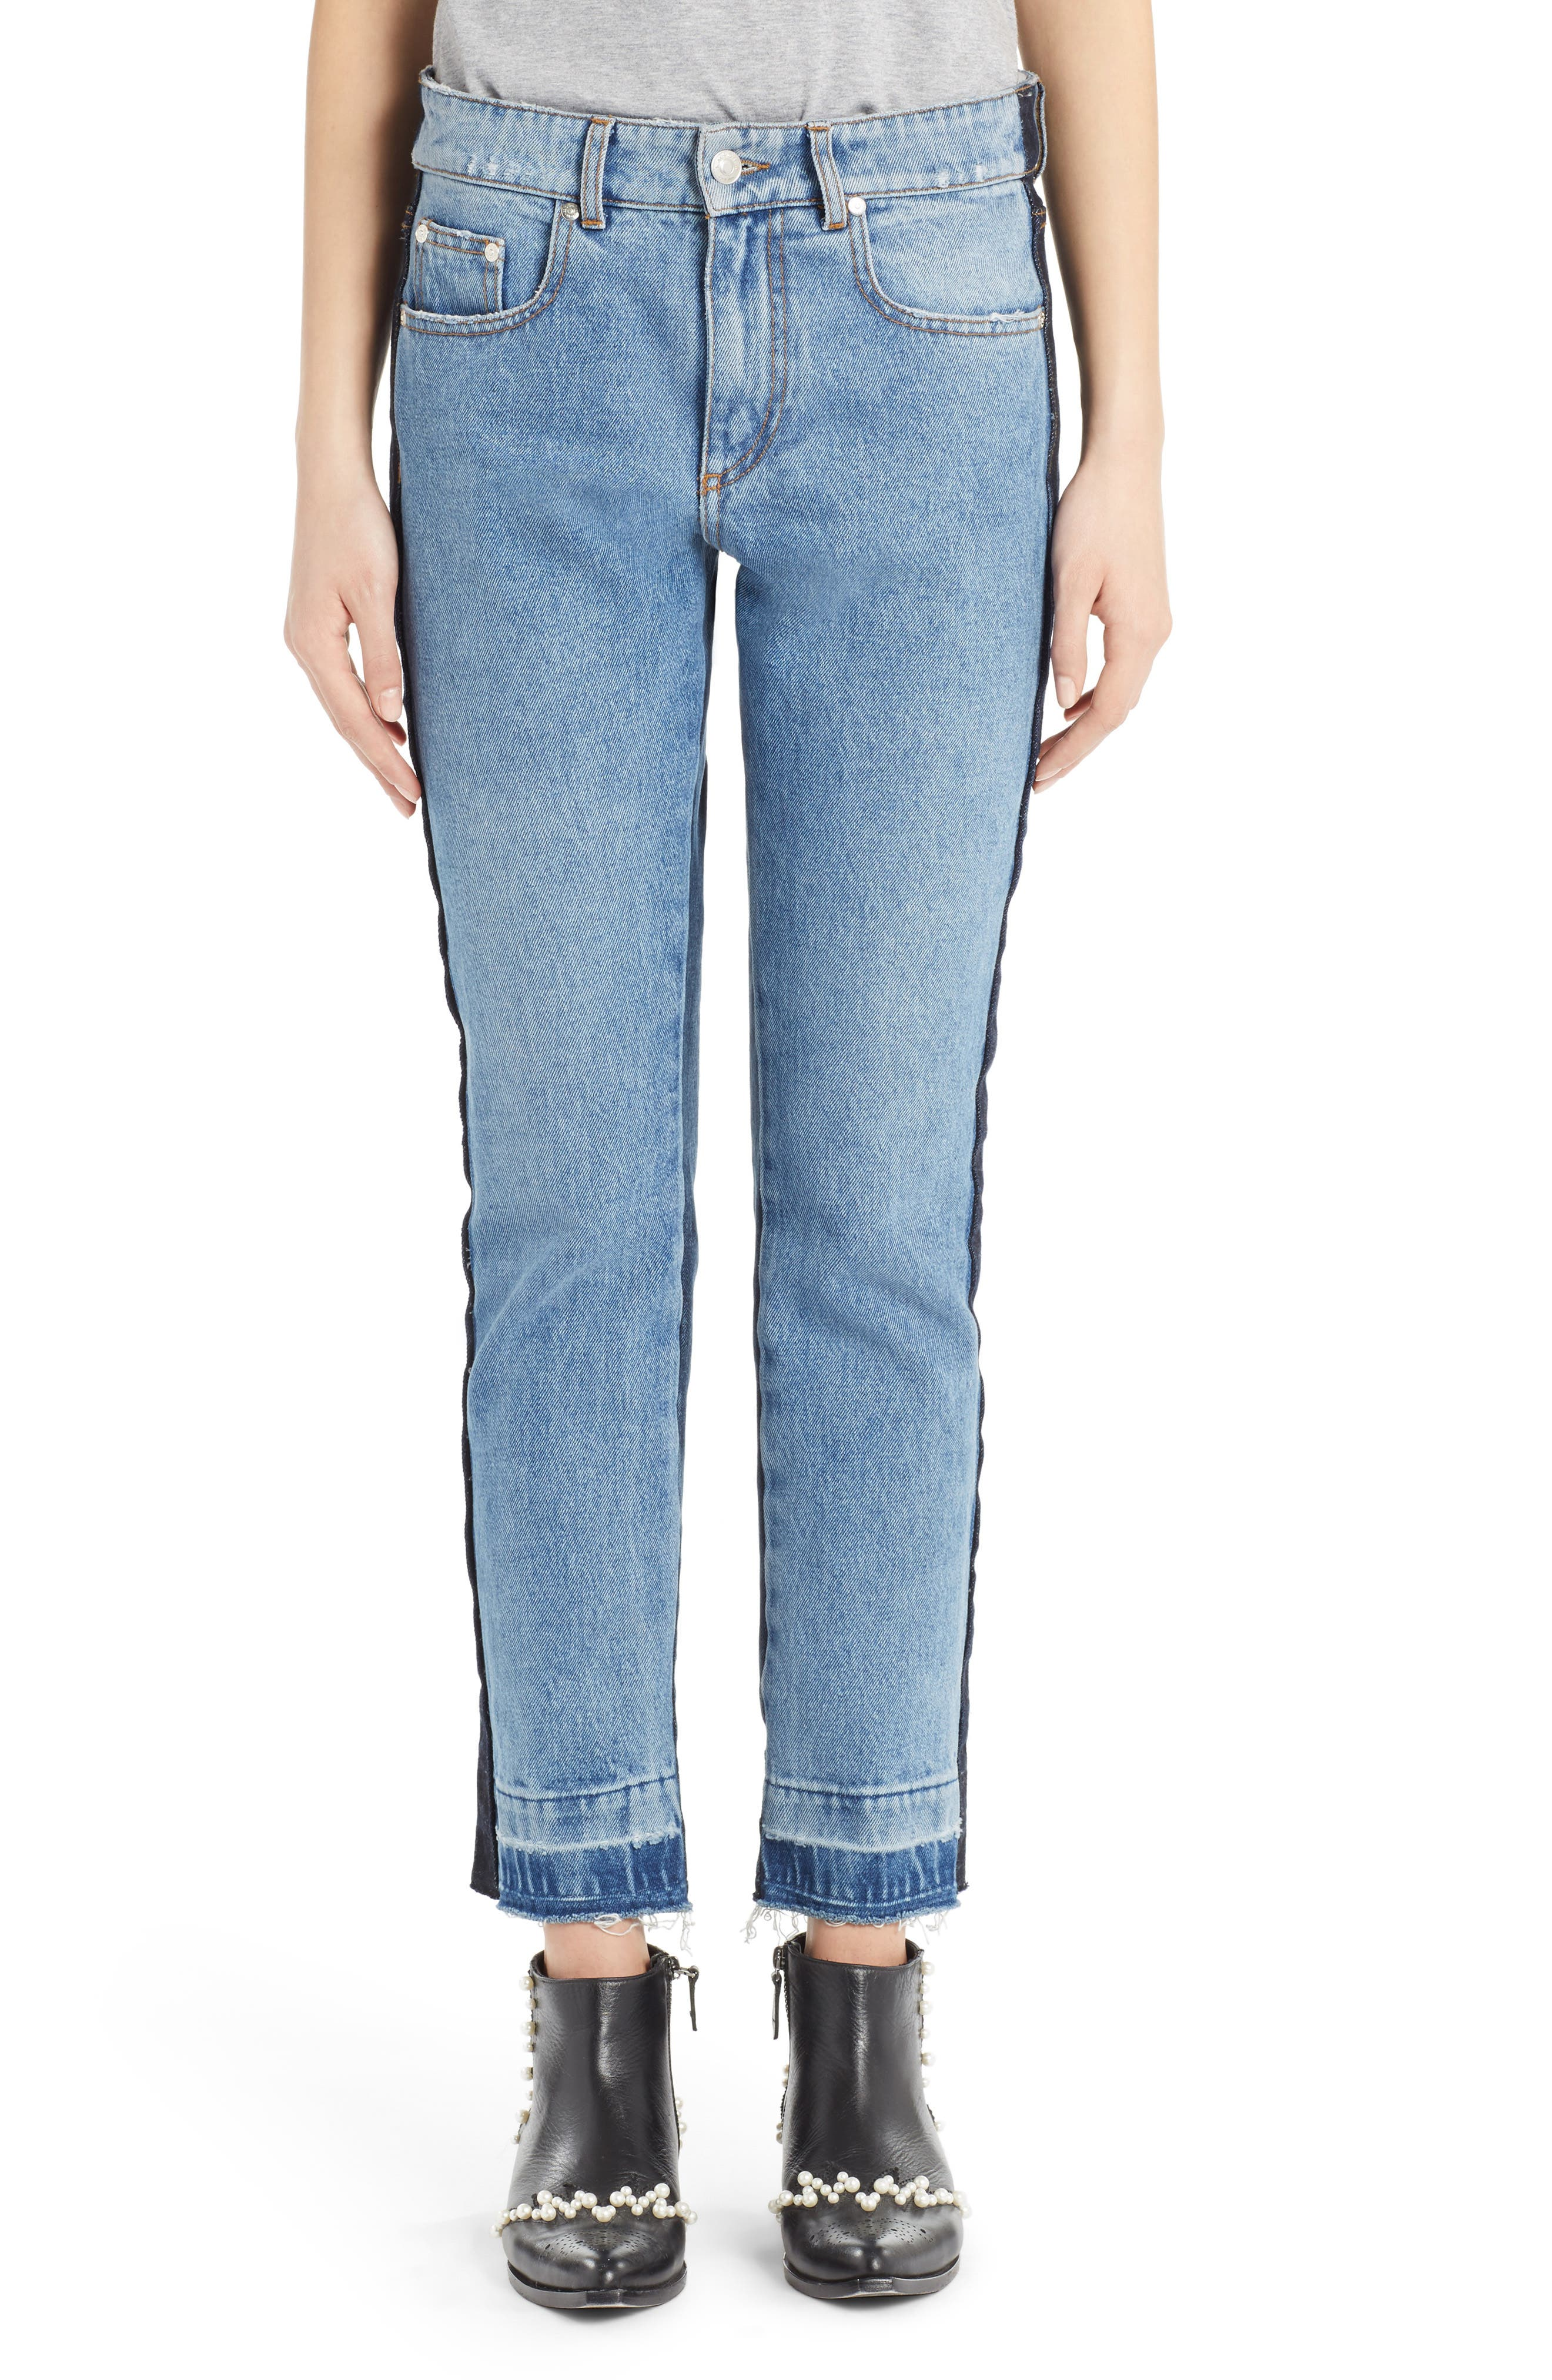 Alternate Image 1 Selected - MSGM Paneled Jeans